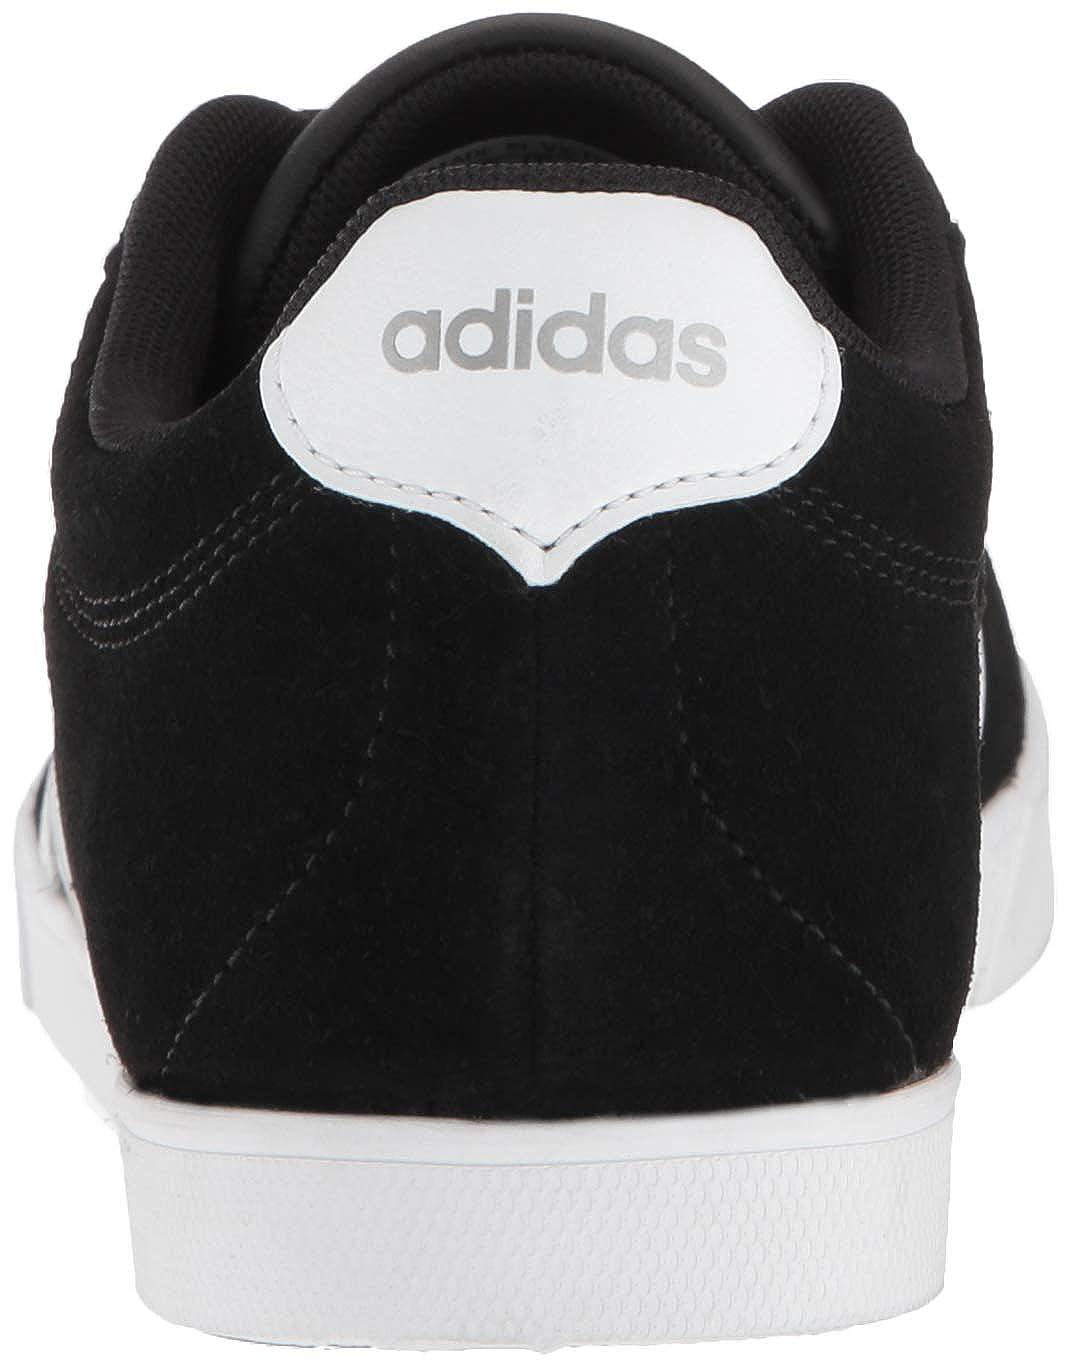 37b1439b79 adidas Women's Courtset Sneaker